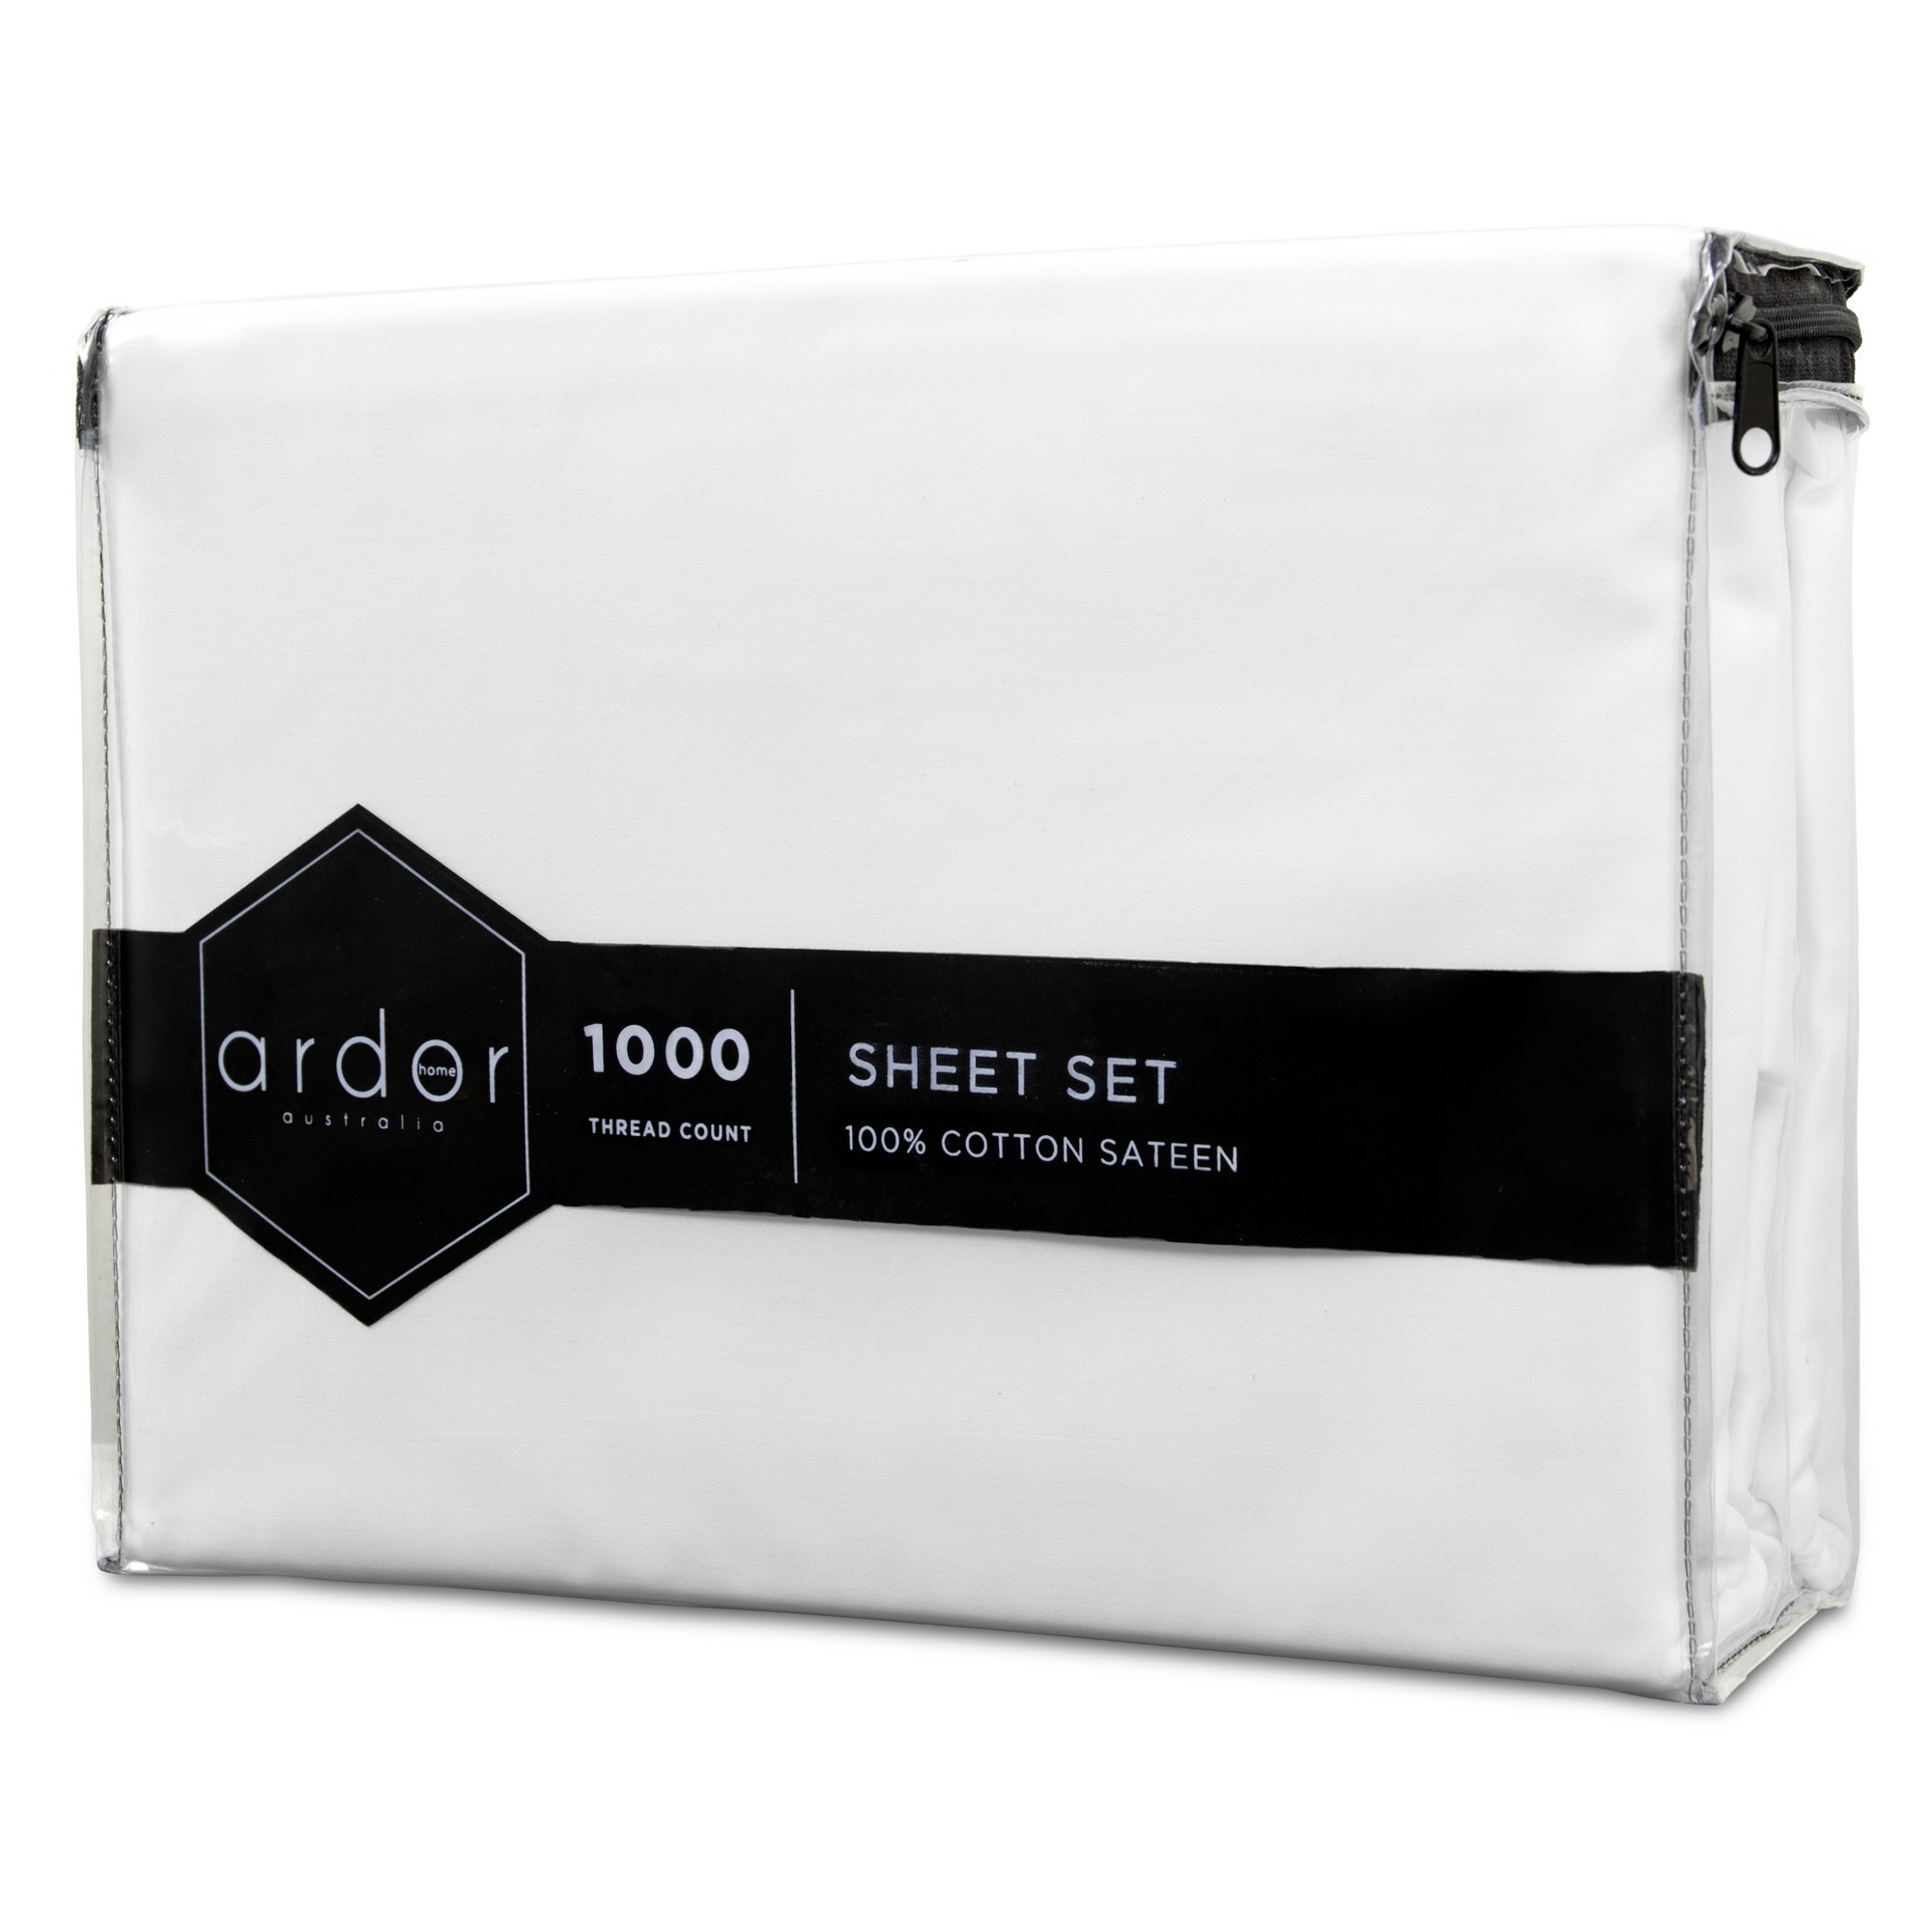 Ardor 1000TC Cotton Sateen Bed Sheet Set, King, White